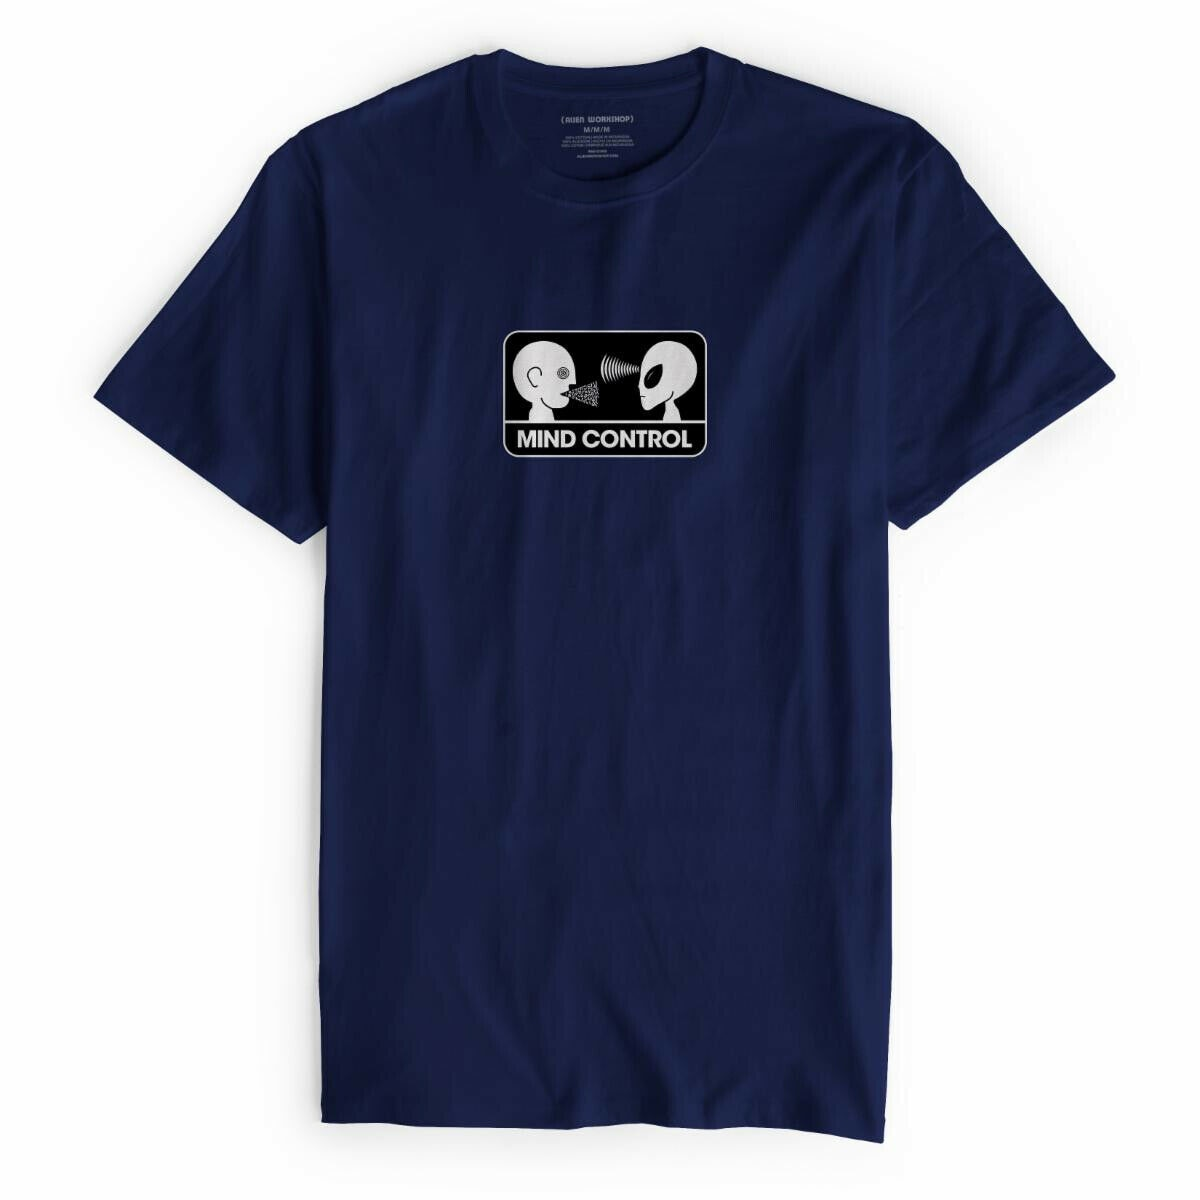 Alien Workshop camisa para correr patineta Control mental Midnight Navy